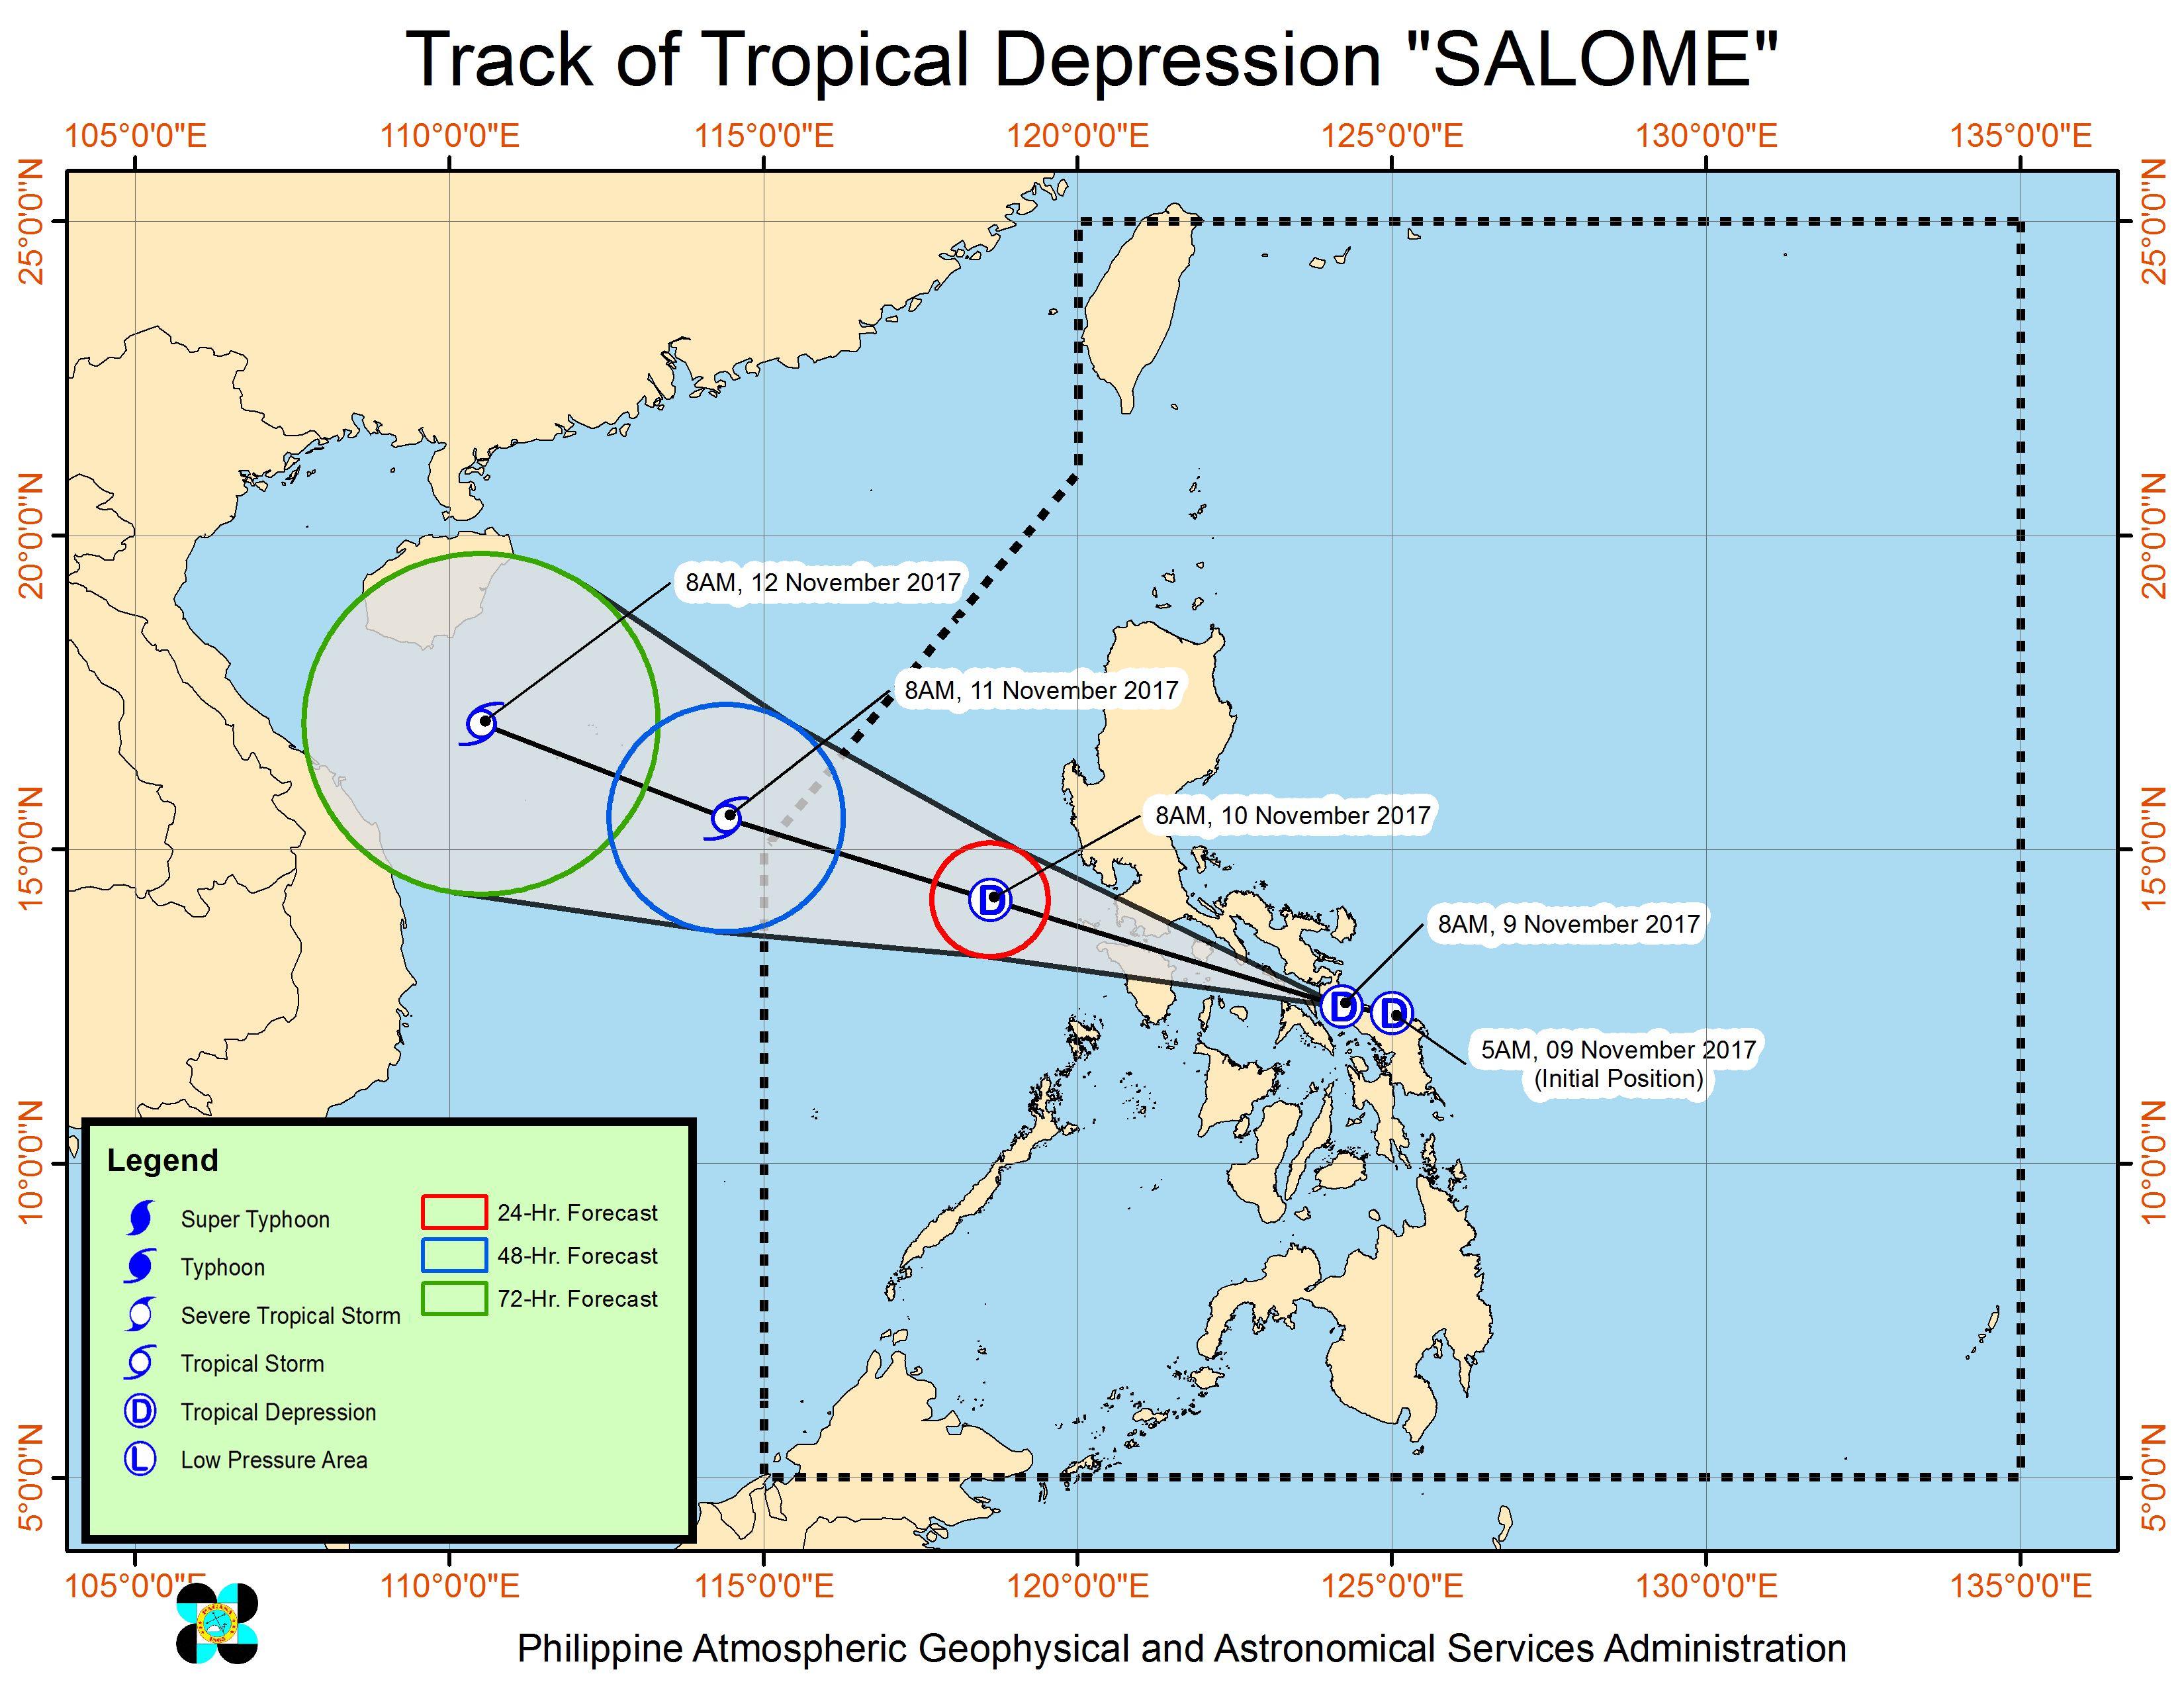 Forecast track of Tropical Depression Salome as of November 9, 11 am. Image courtesy of PAGASA